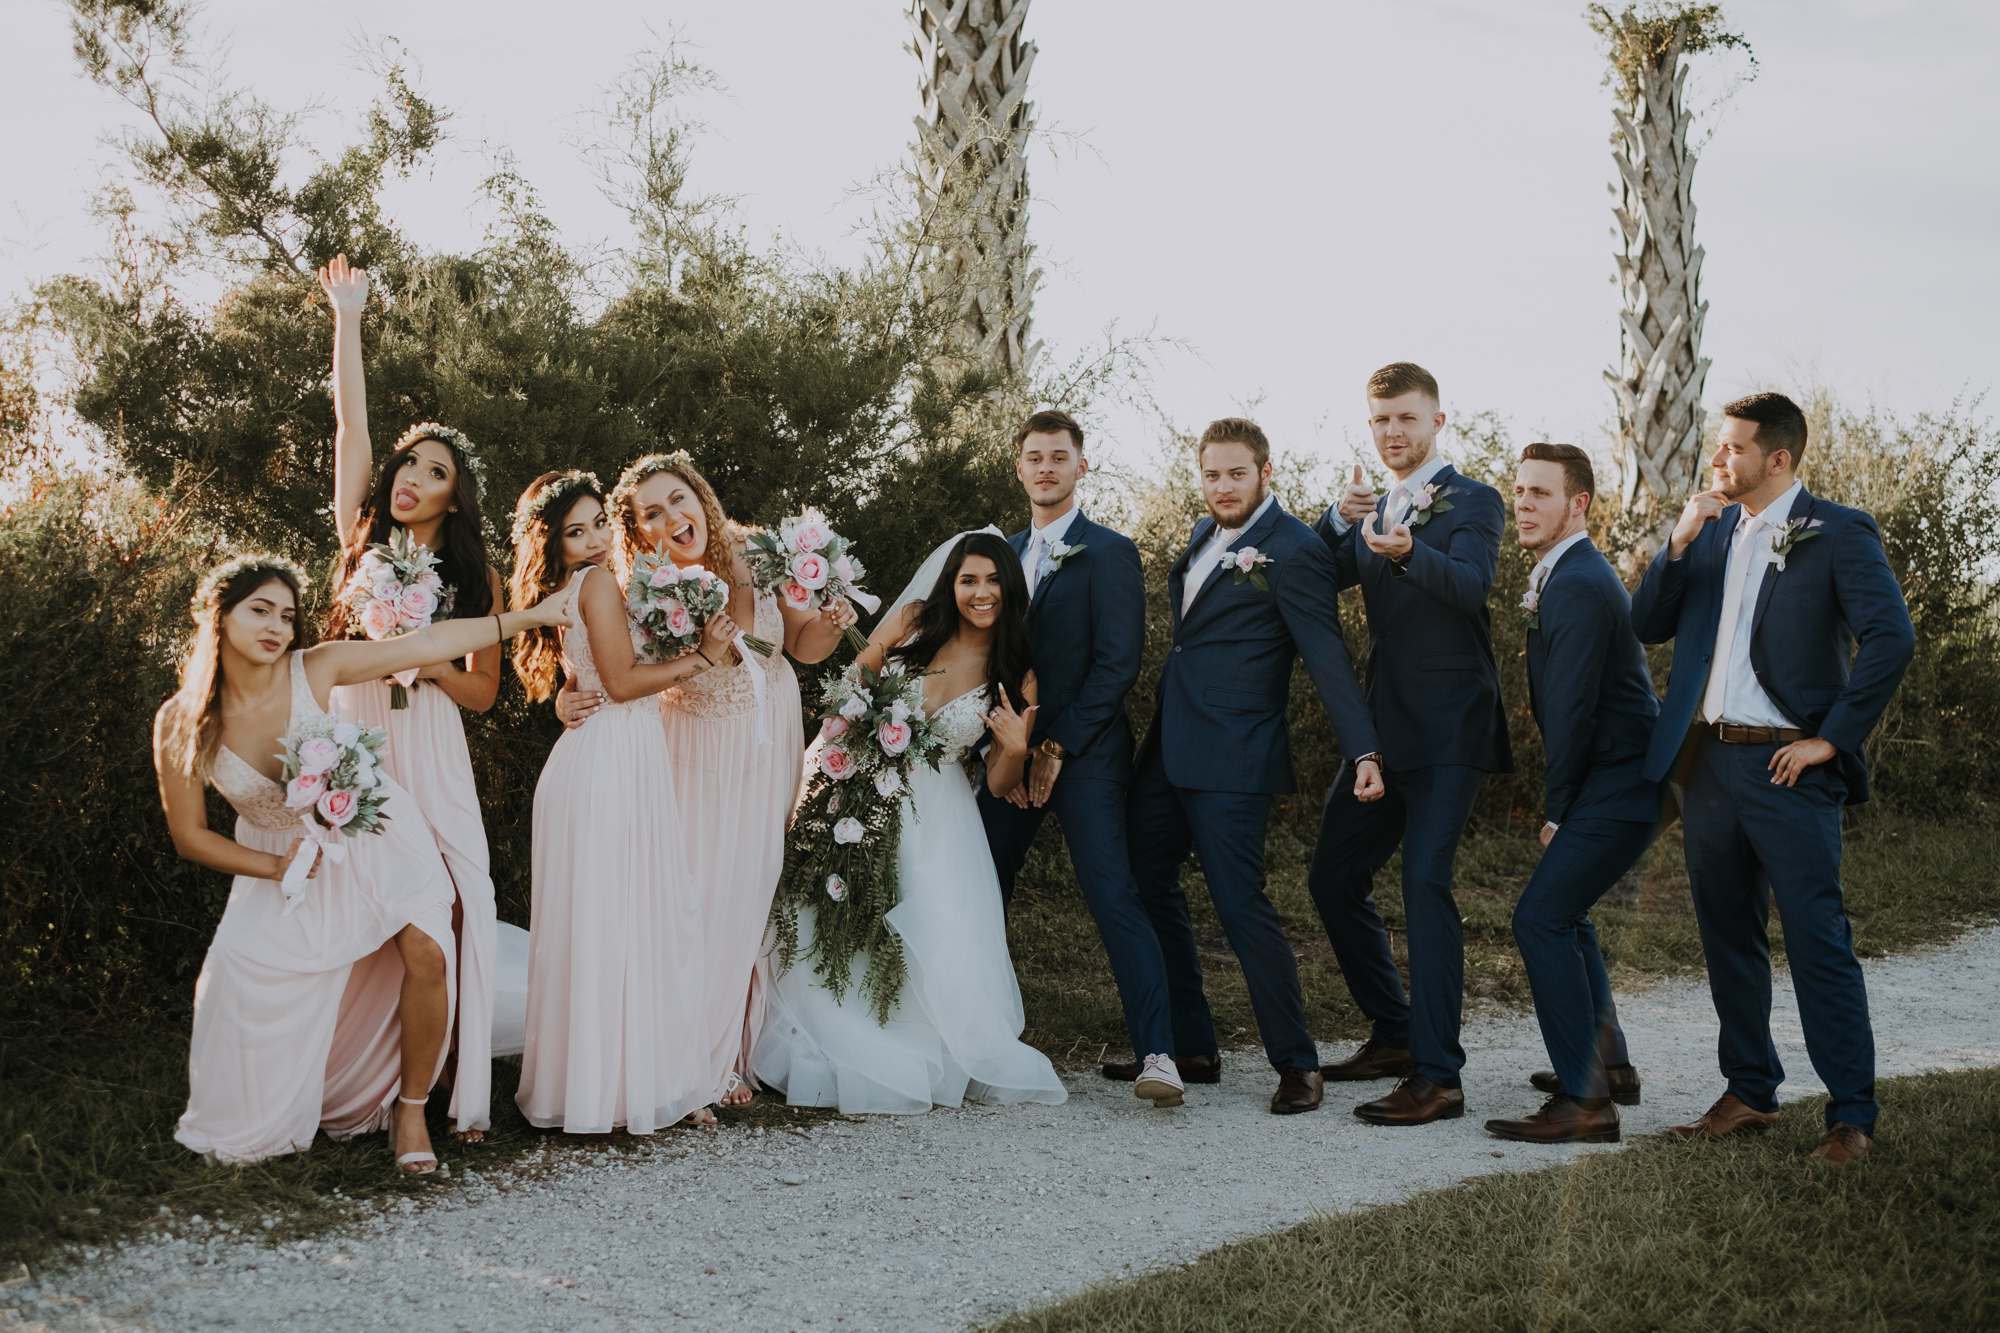 boho bridal party | bridal party portraits | bridesmaid portraits | groomsmen portraits | outdoor Florida wedding | sarasota wedding